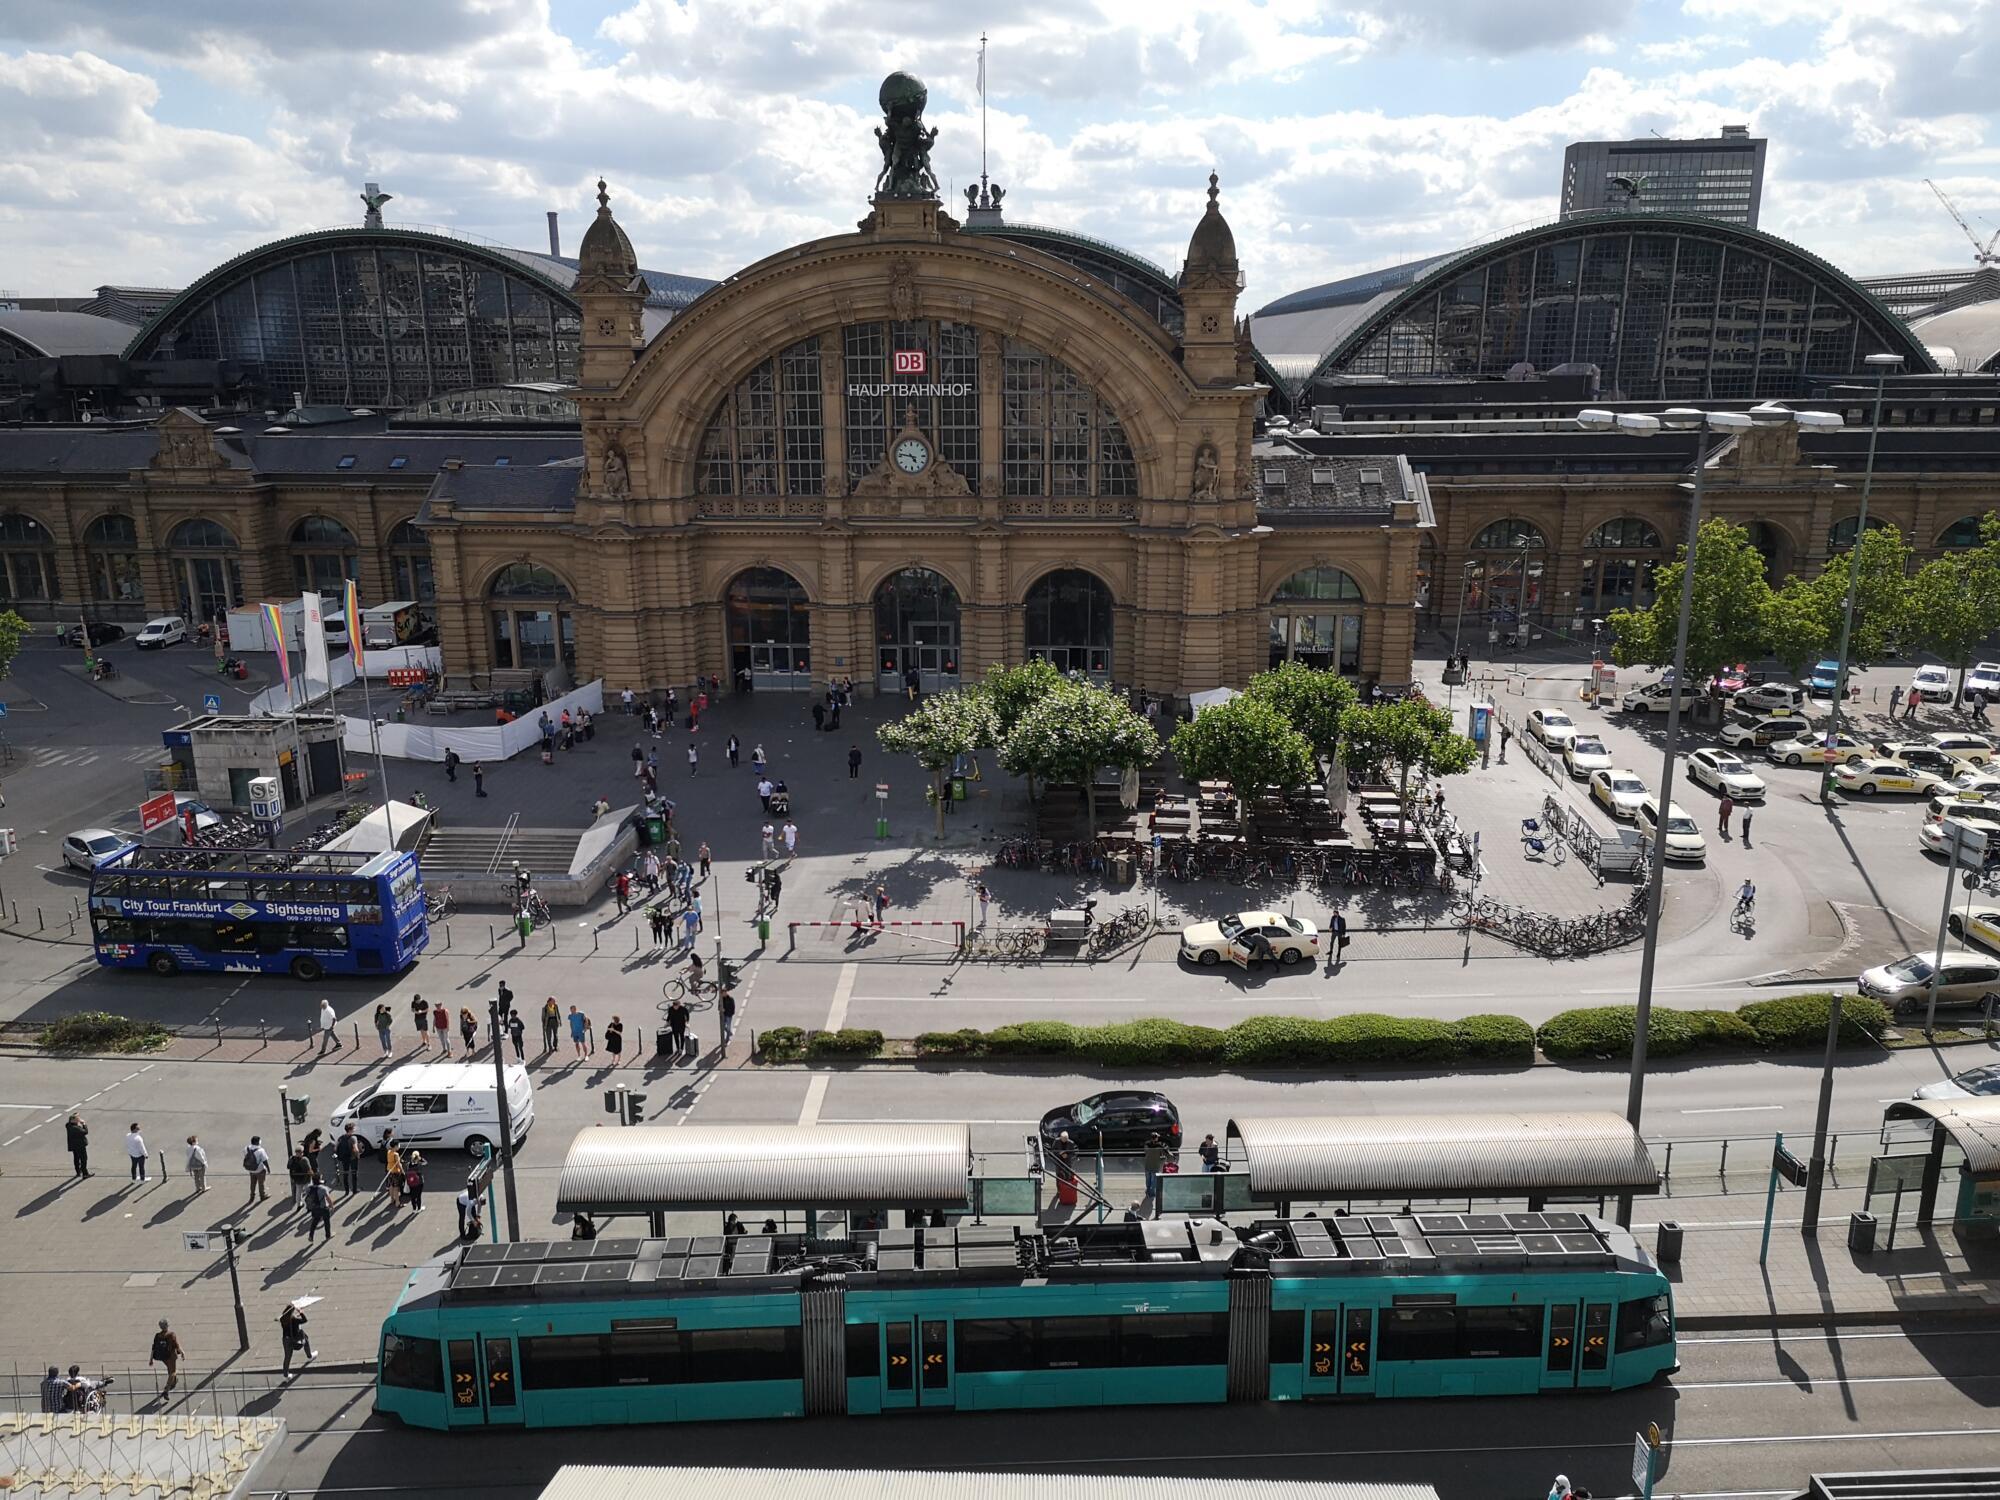 POLIS welcomes new member FrankfurtRheinMain